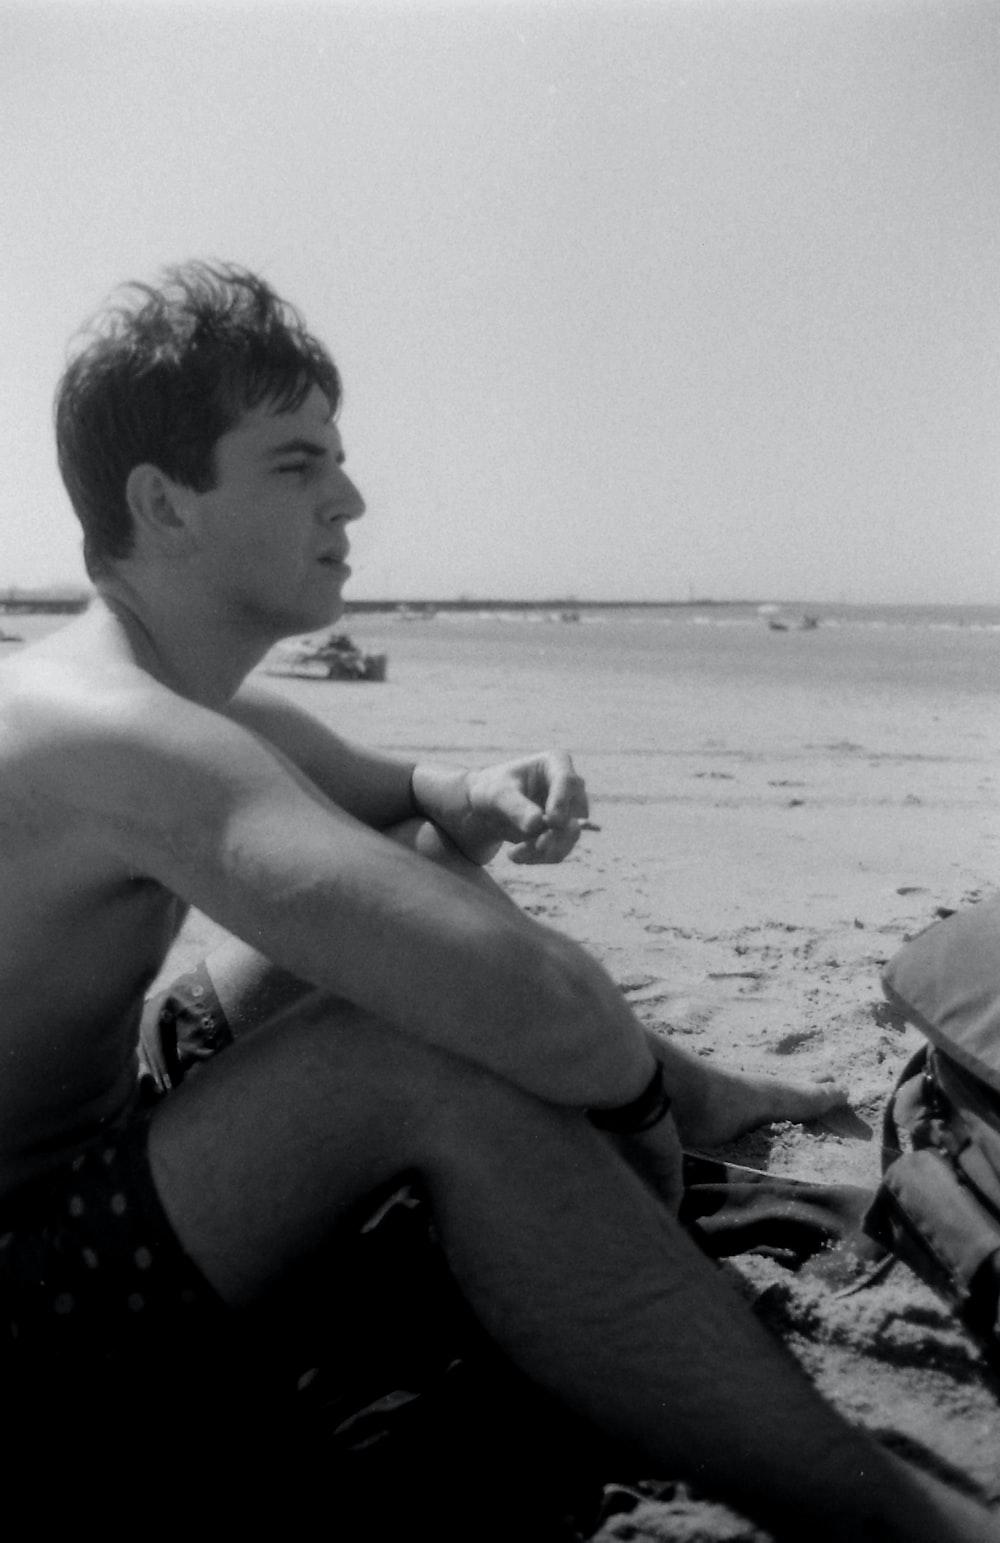 topless boy sitting on beach shore